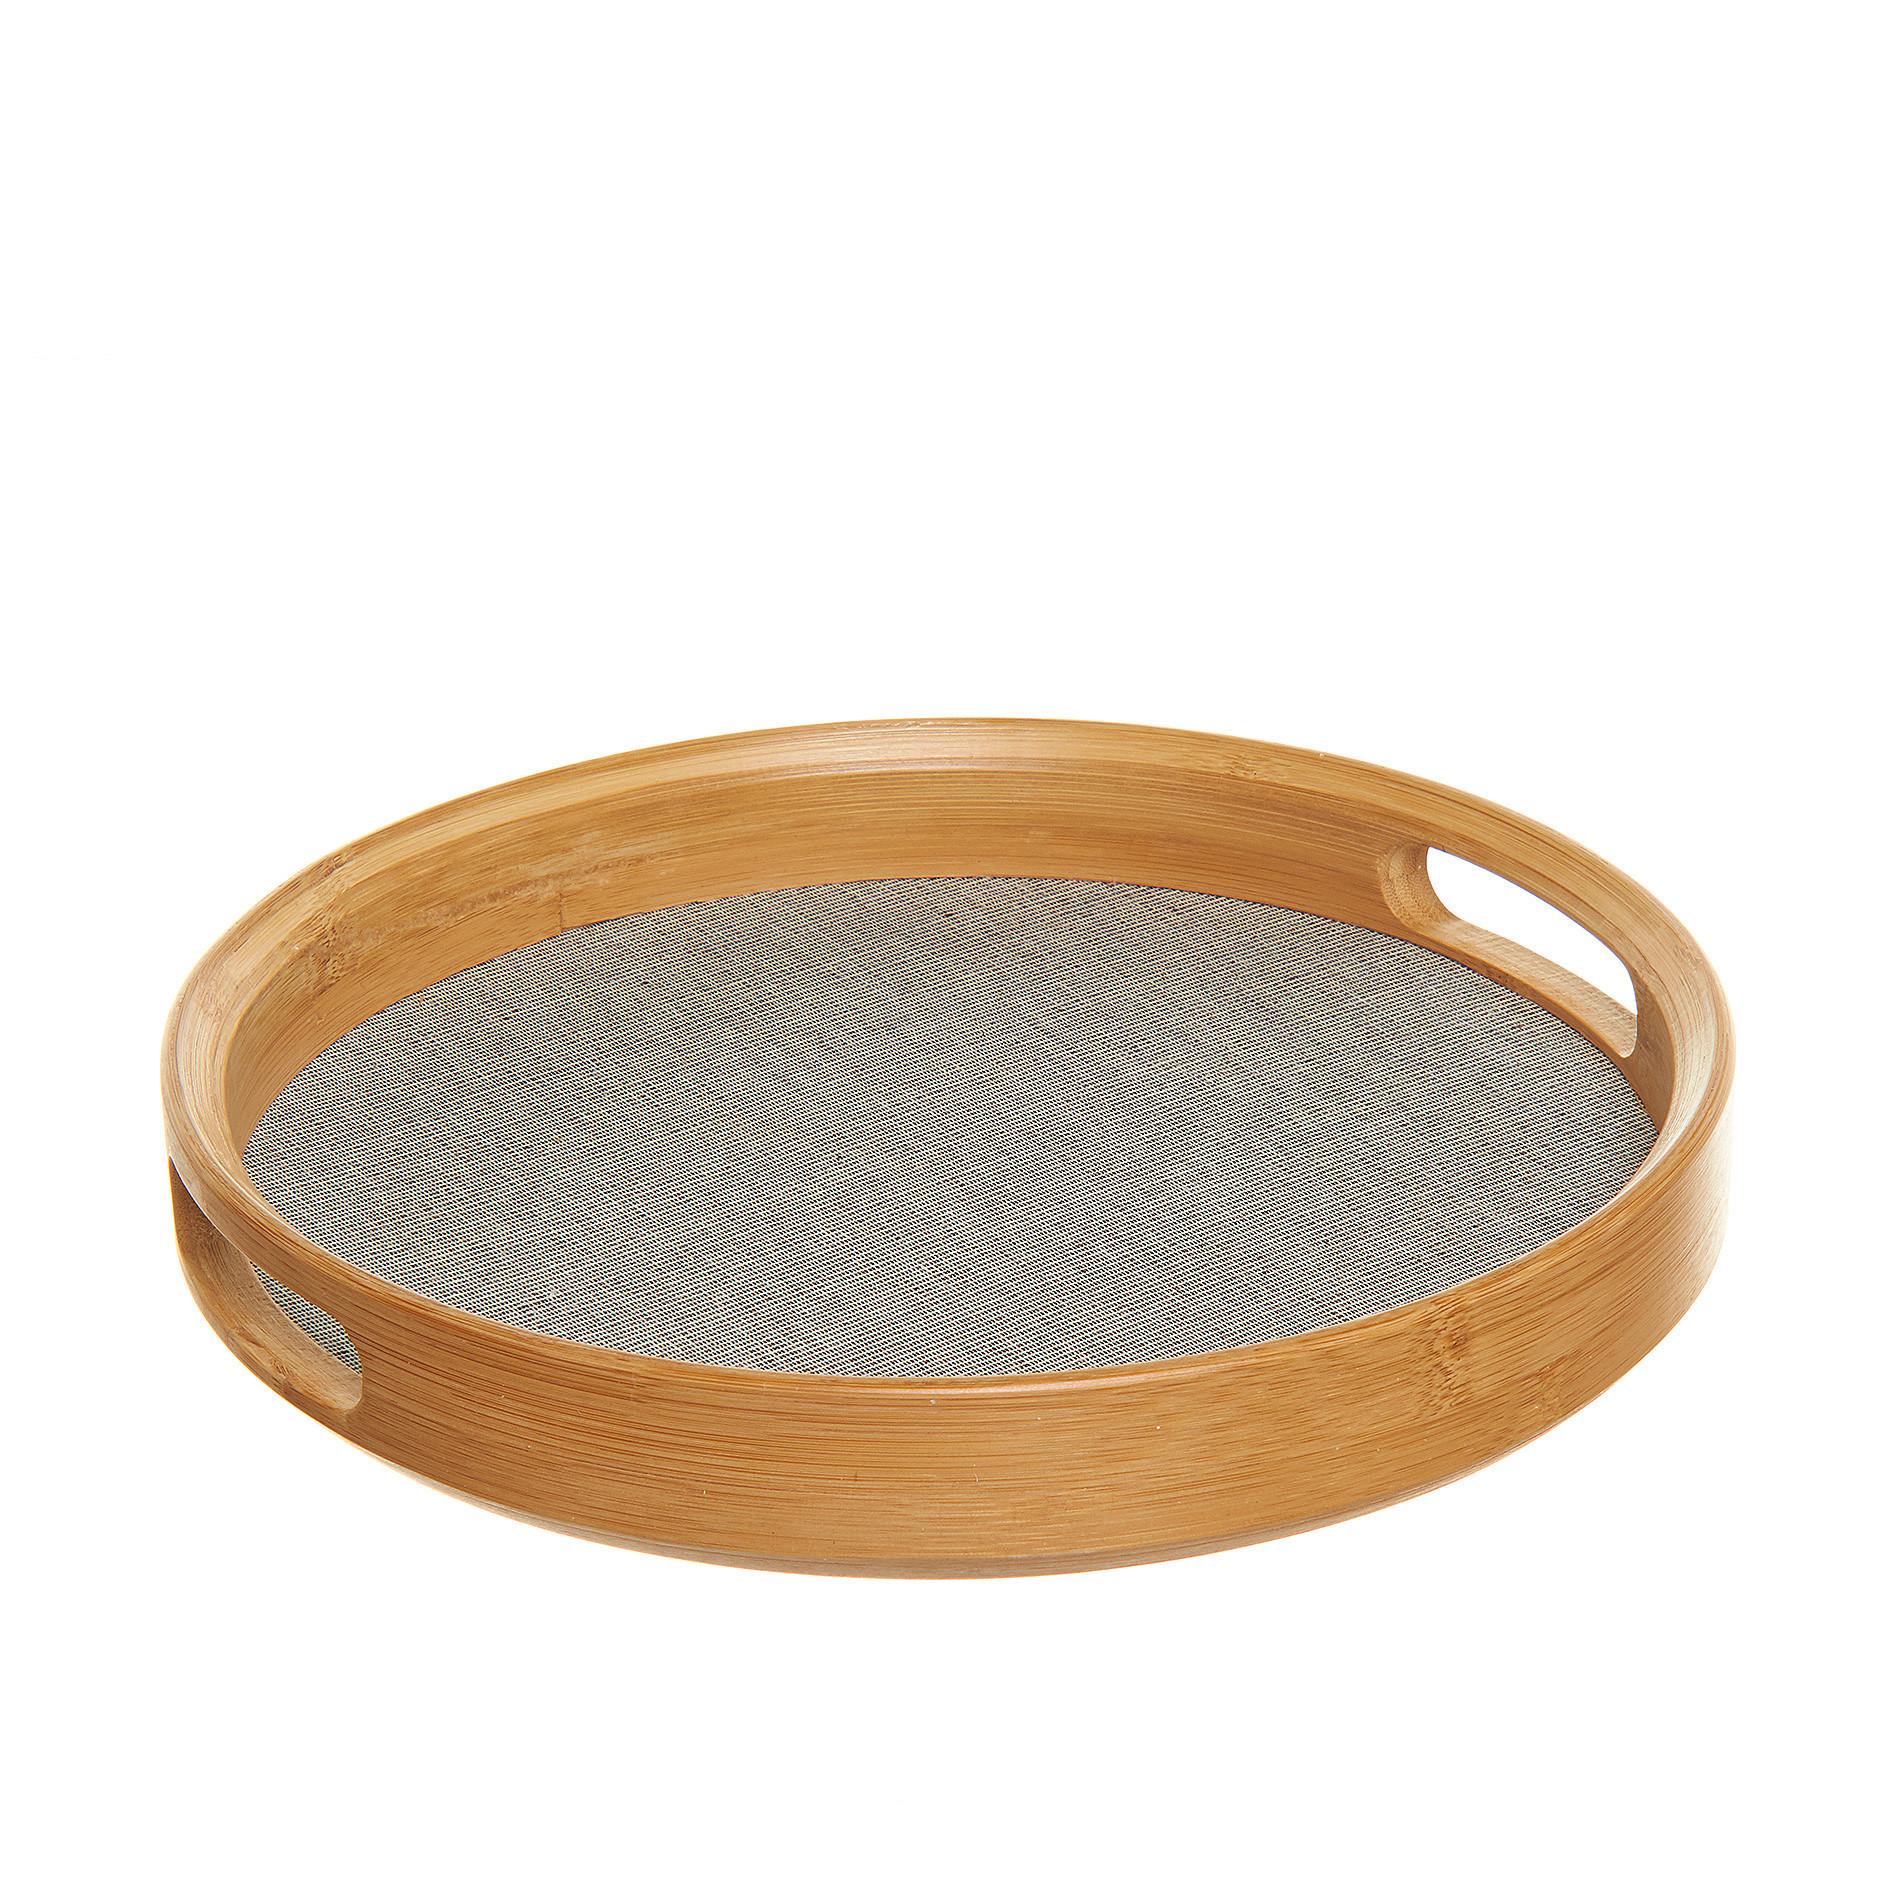 Vassoio rotondo in bamboo e cotone, Grigio, large image number 0